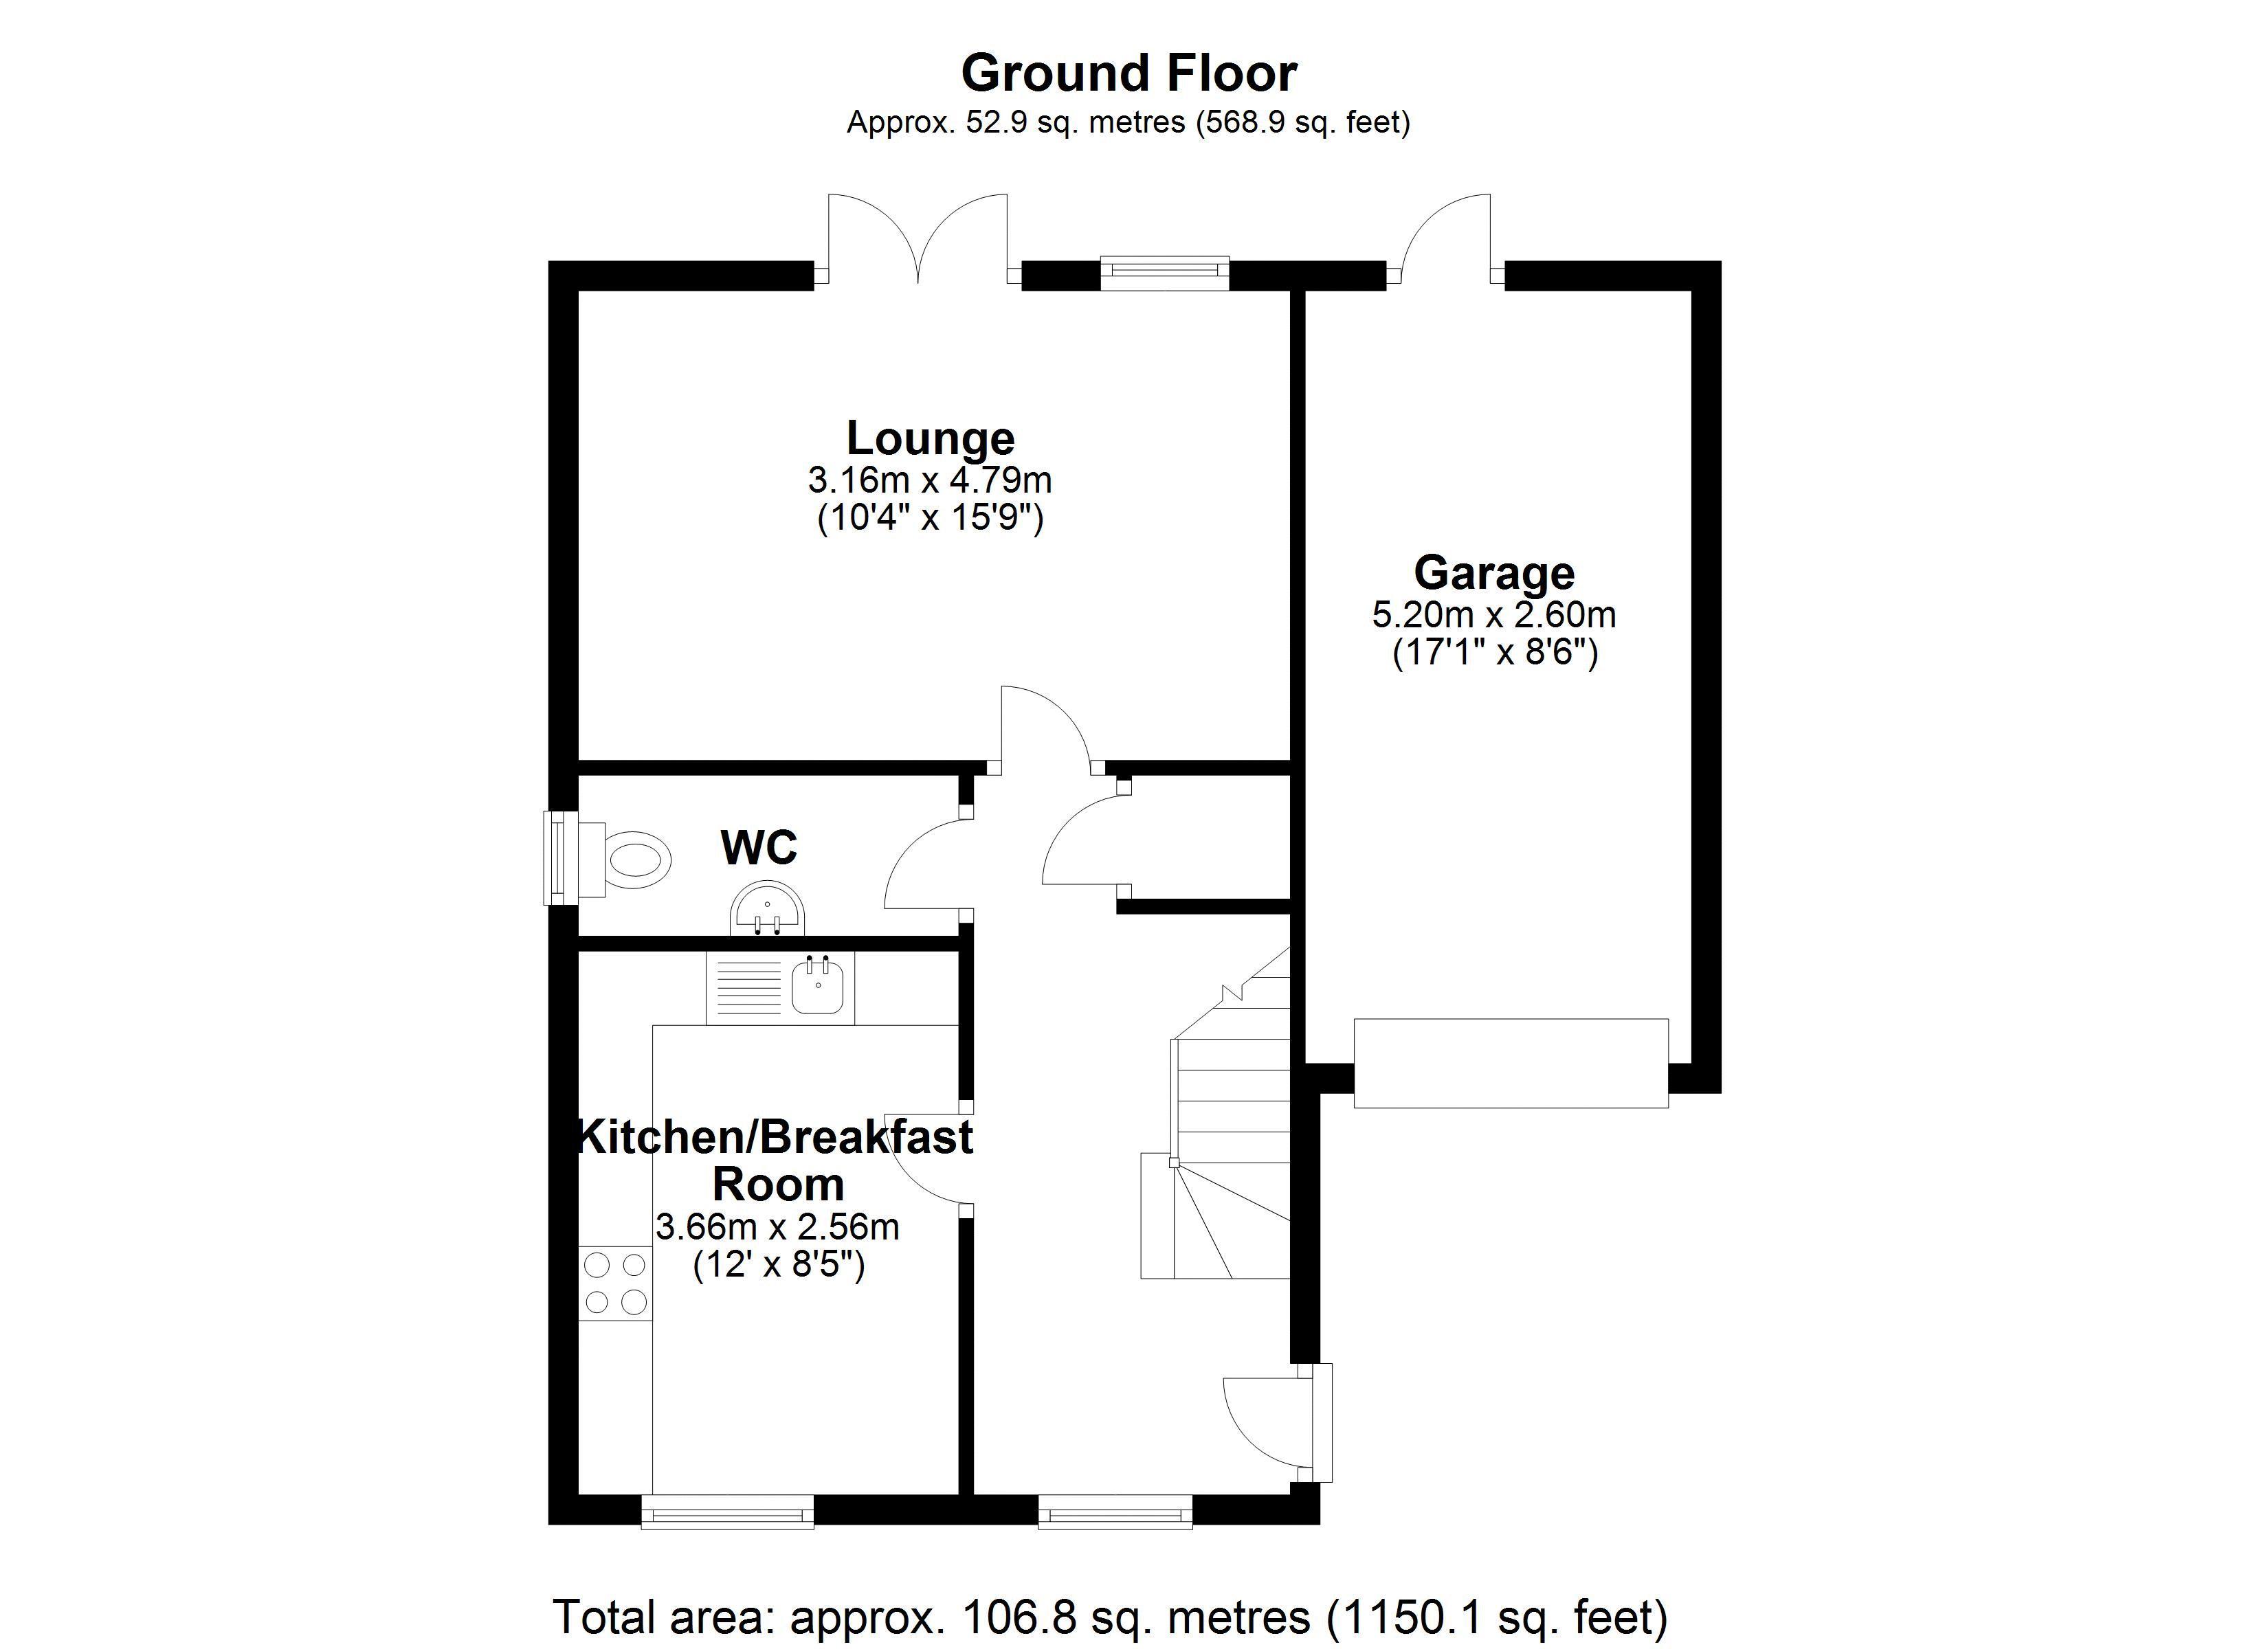 The Embers Ground floor plan